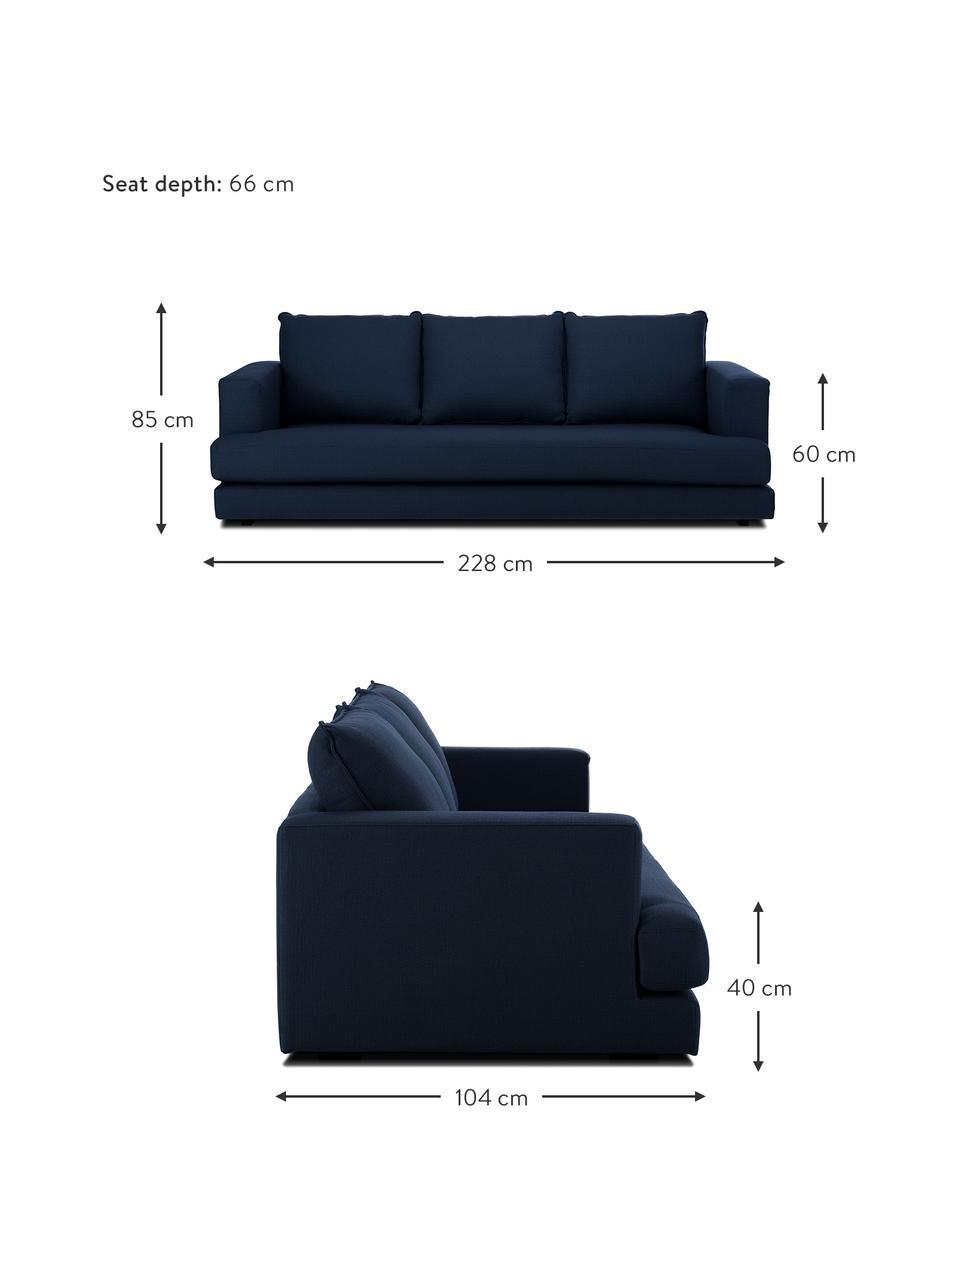 Bank Tribeca (3-zits) in donkerblauw, Bekleding: 100% polyester, Frame: massief beukenhout, Poten: massief gelakt beukenhout, Stof donkerblauw, 228 x 104 cm